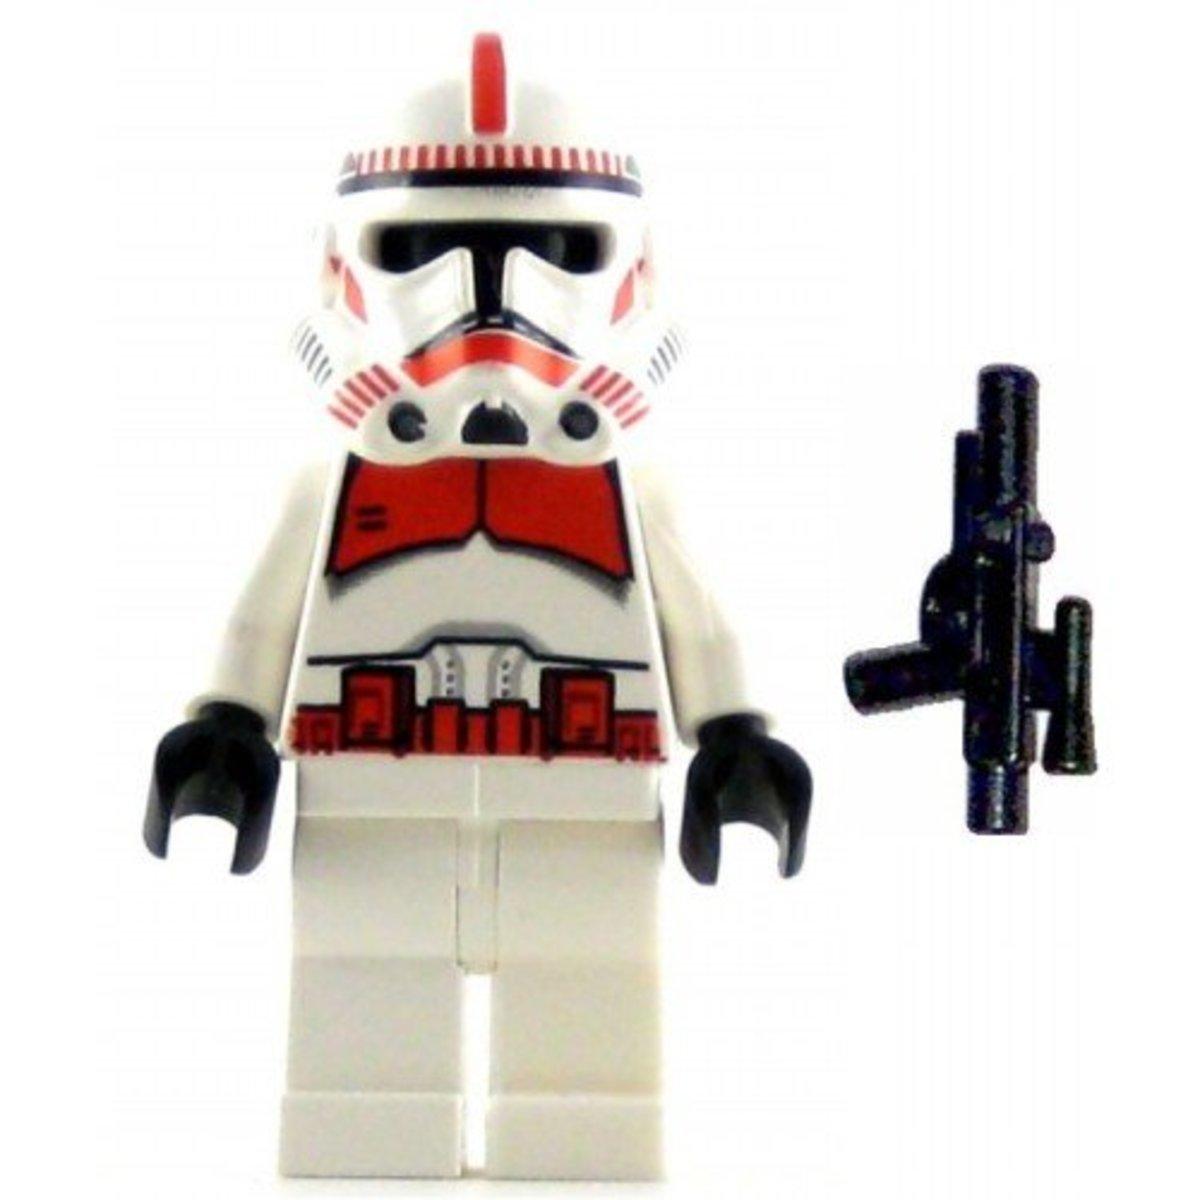 LEGO Star Wars AT-AP Walker 7671 Shock Trooper Minifigure